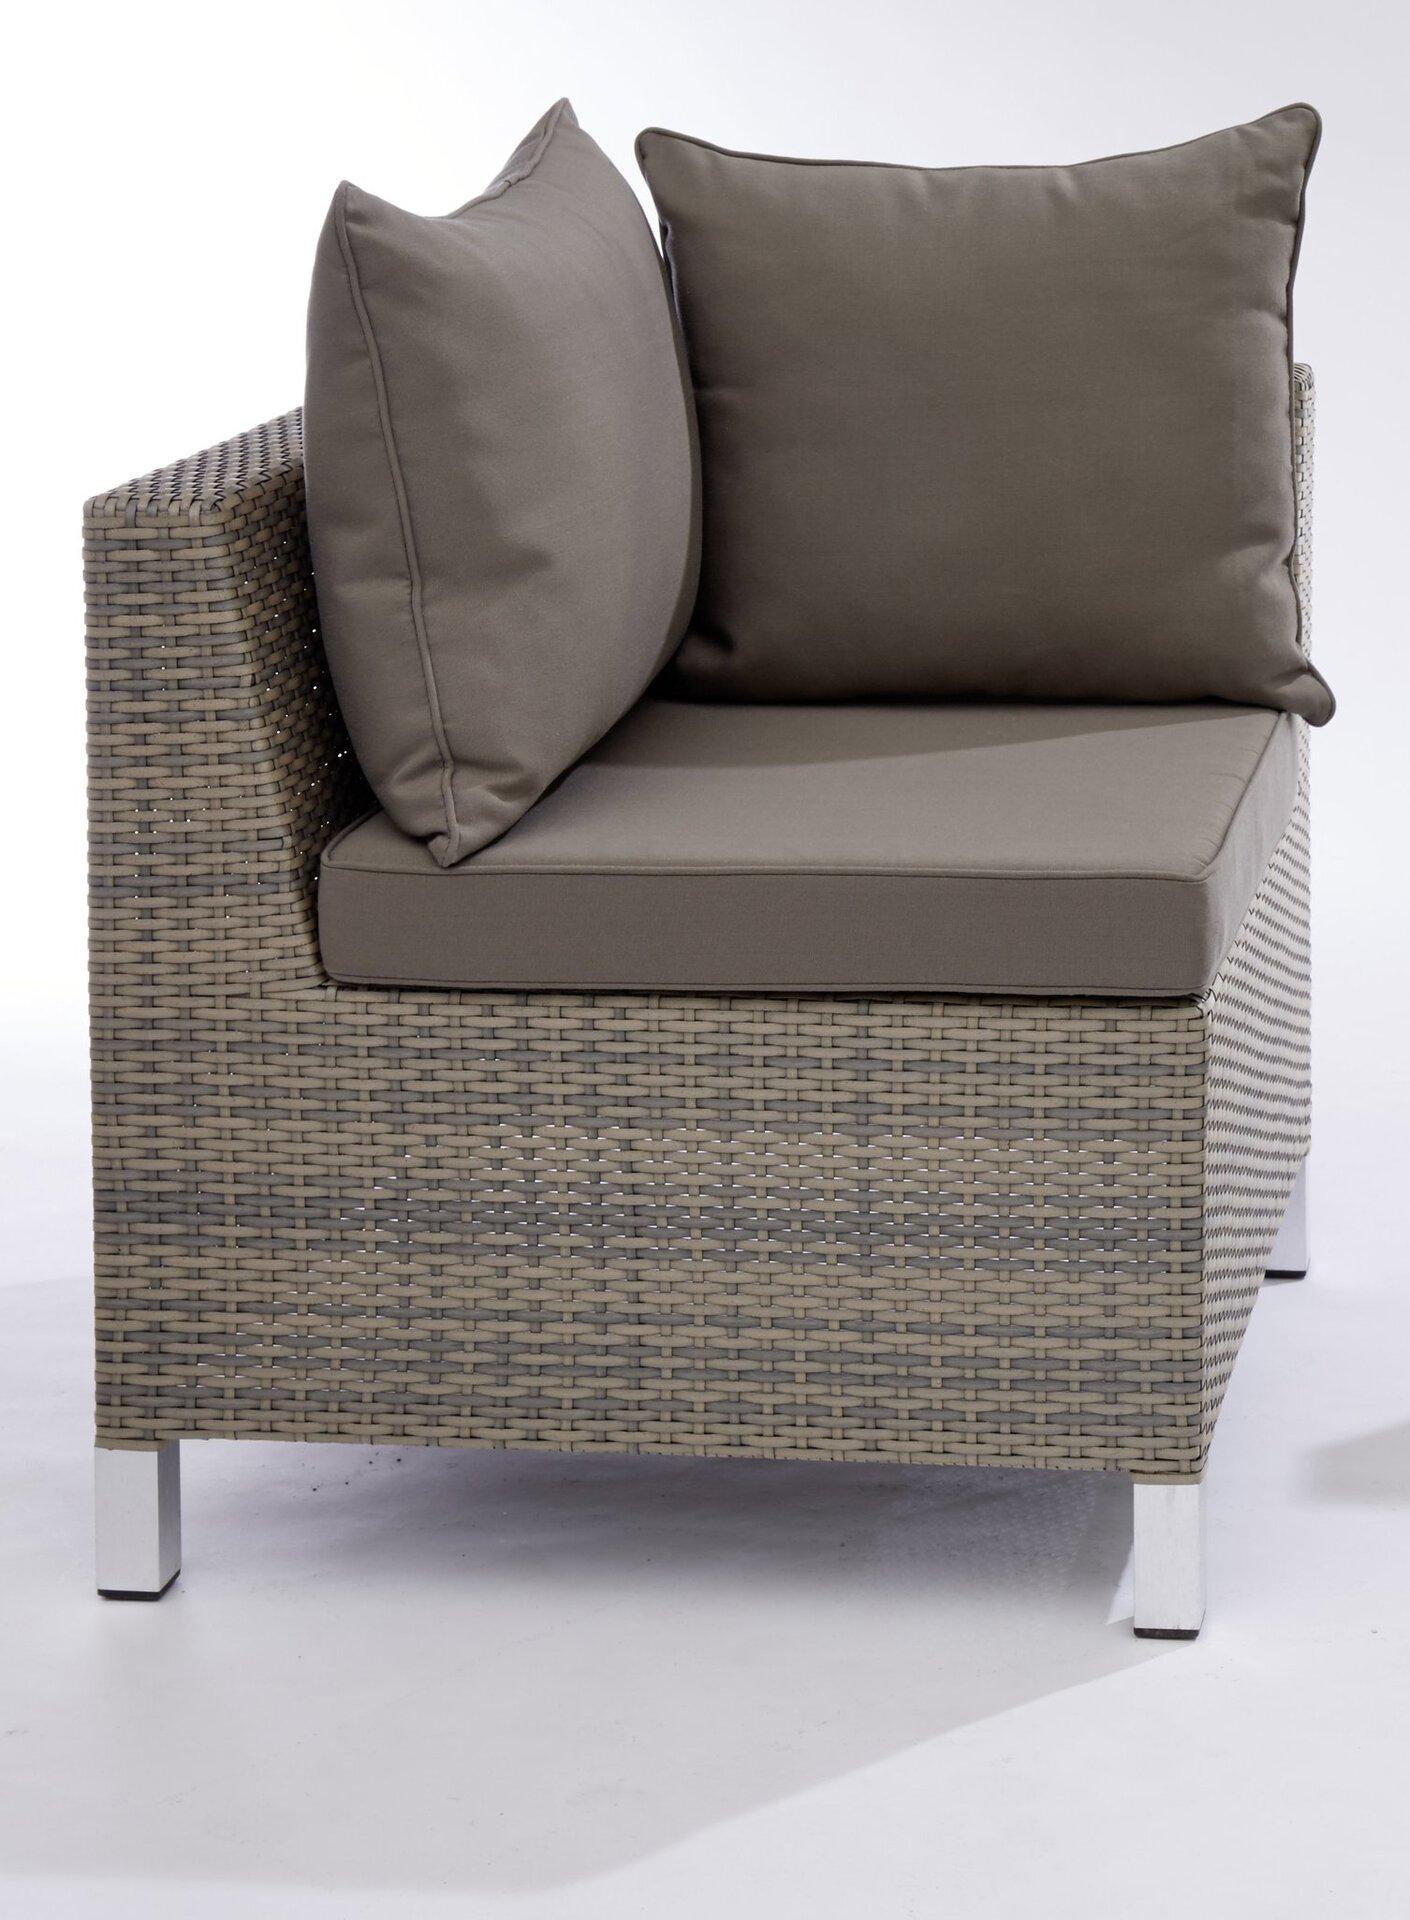 Eckelement SAMANTHA Outdoor Textil grau 70 x 70 x 70 cm